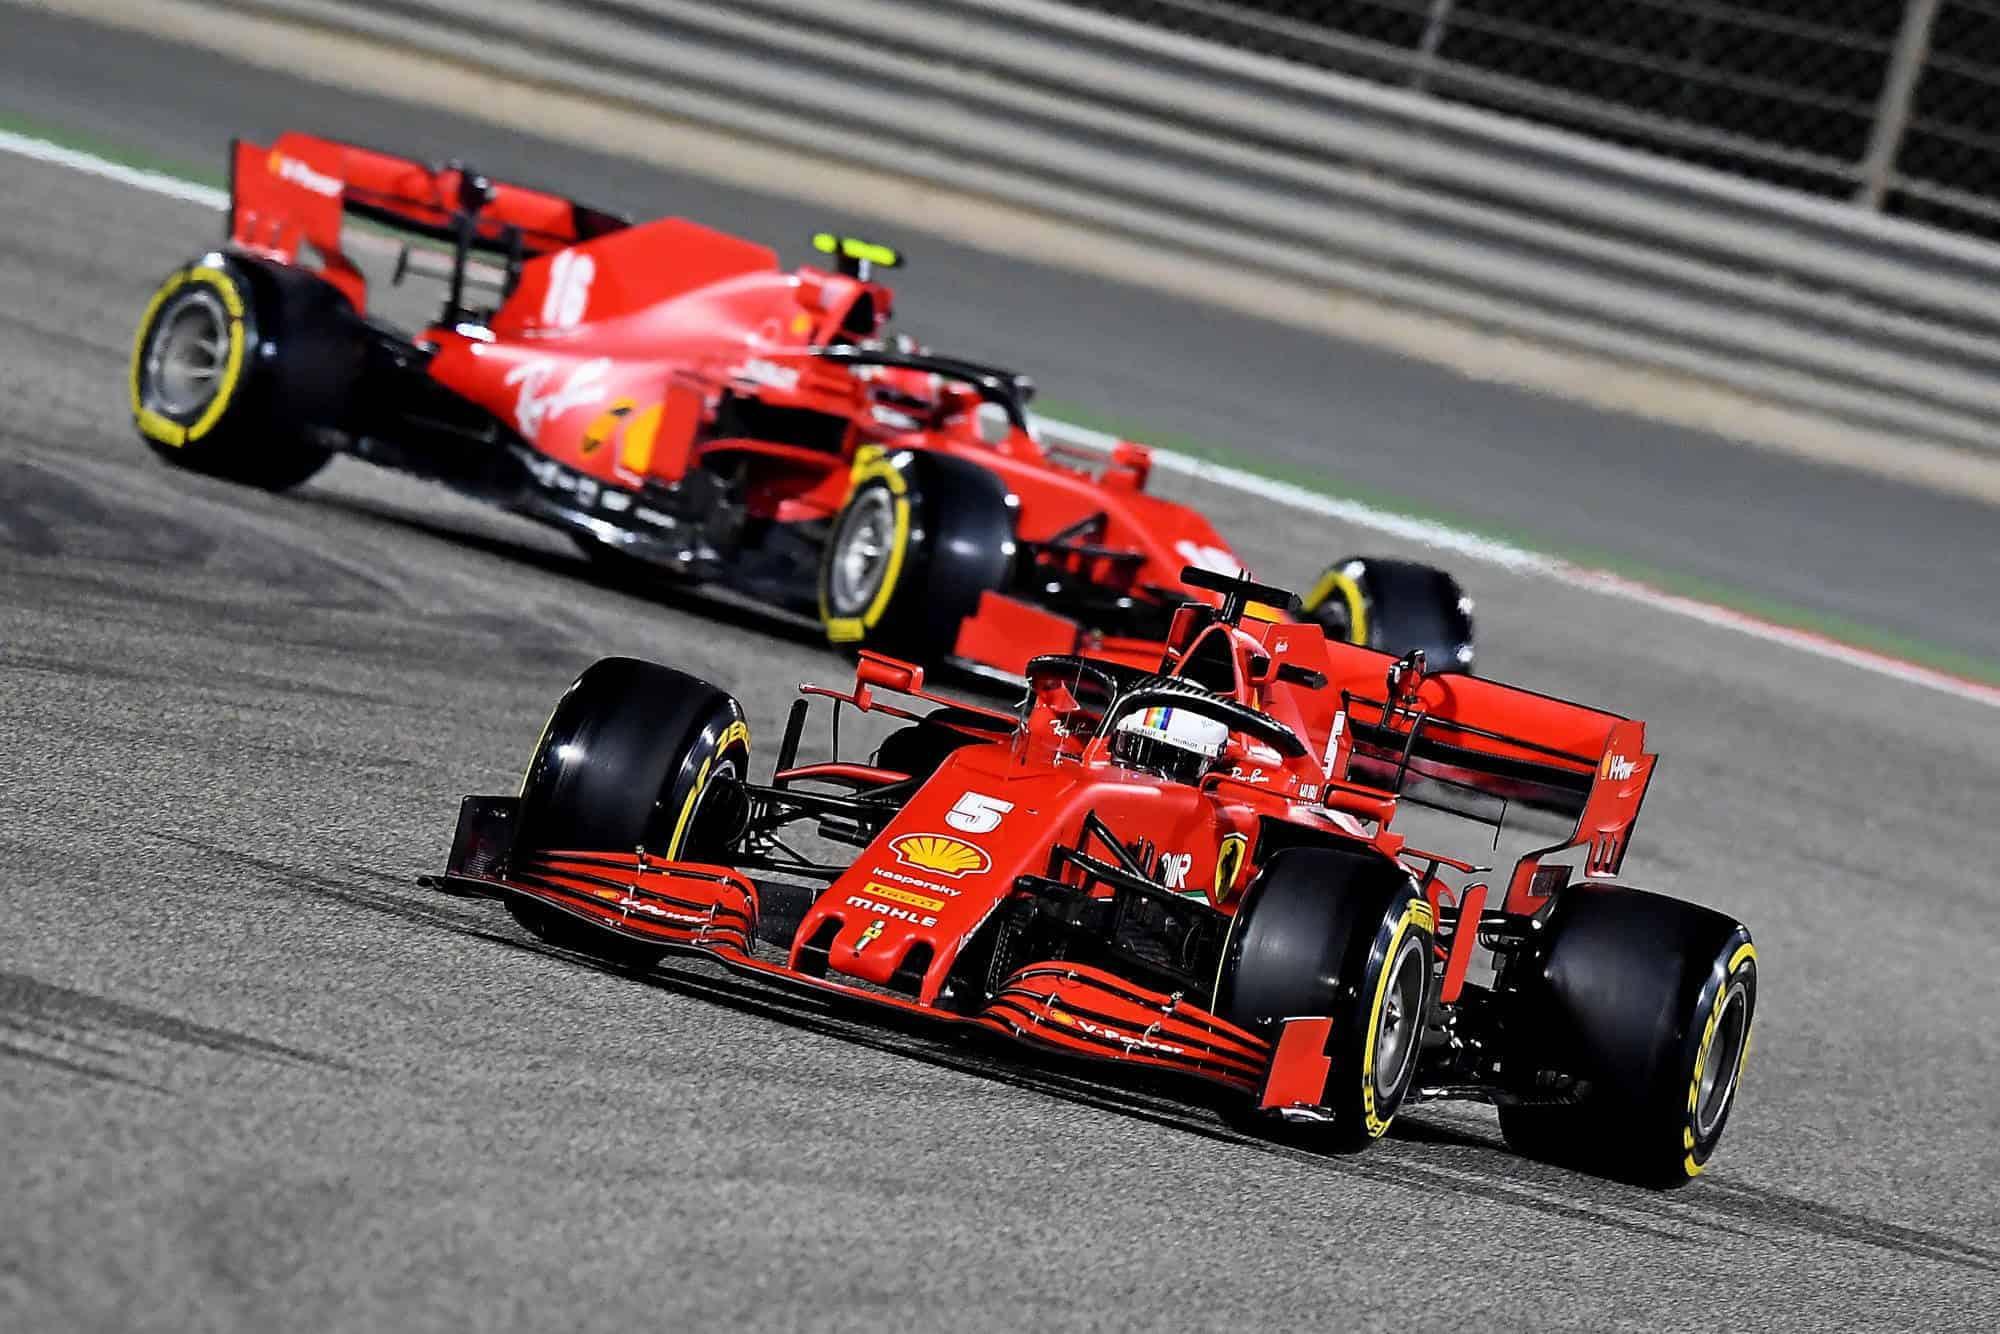 2020 Bahrain GP Vettel leads Leclerc Qualifying Photo Ferrari